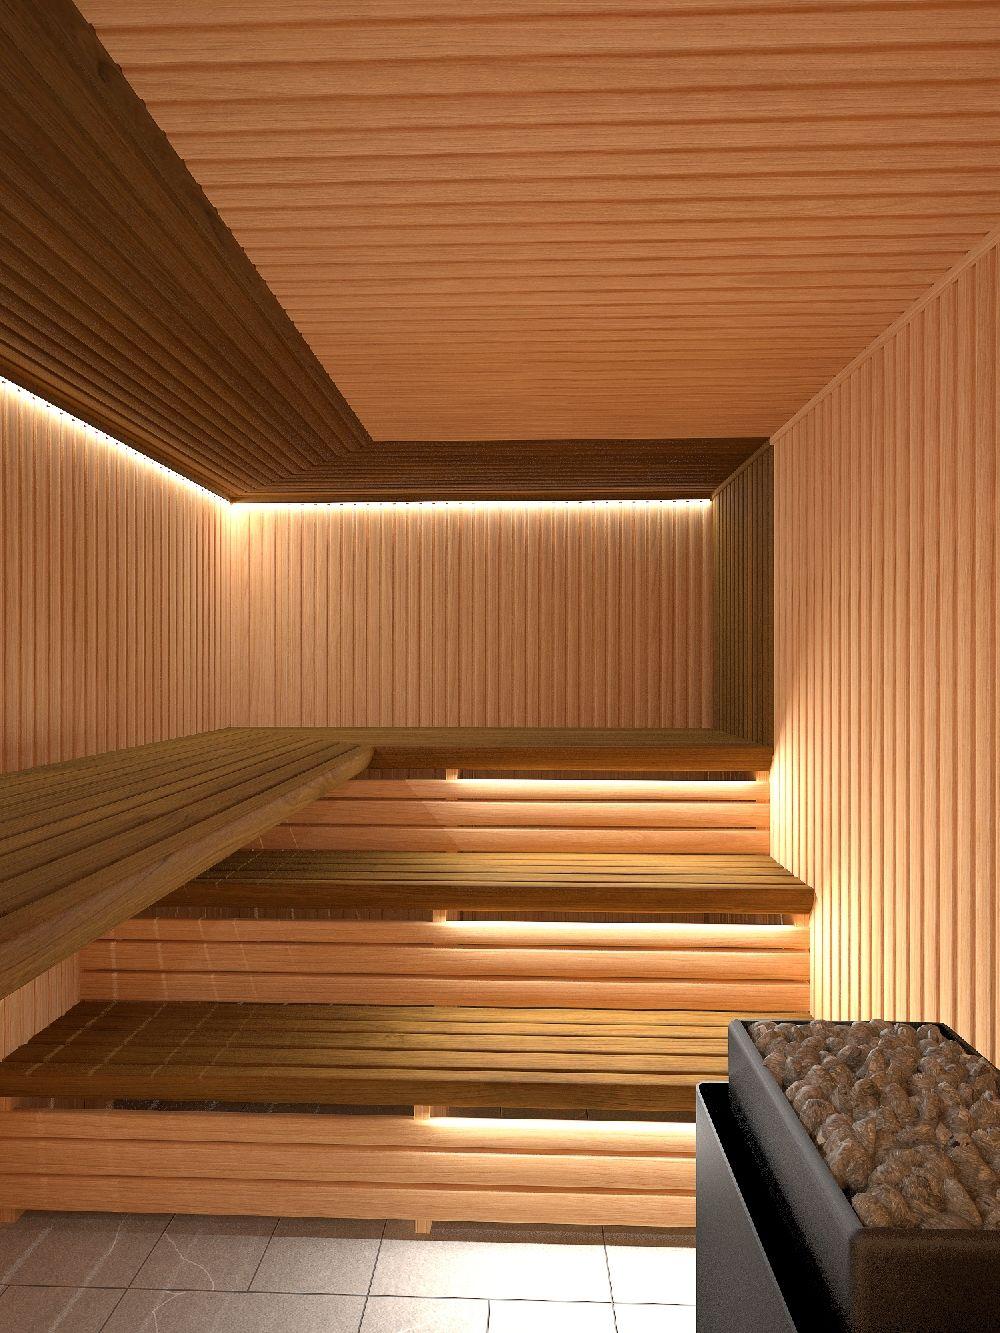 Sauna Project By Artom Bugo At Coroflot Com Spa Dizajn Domiki Dom